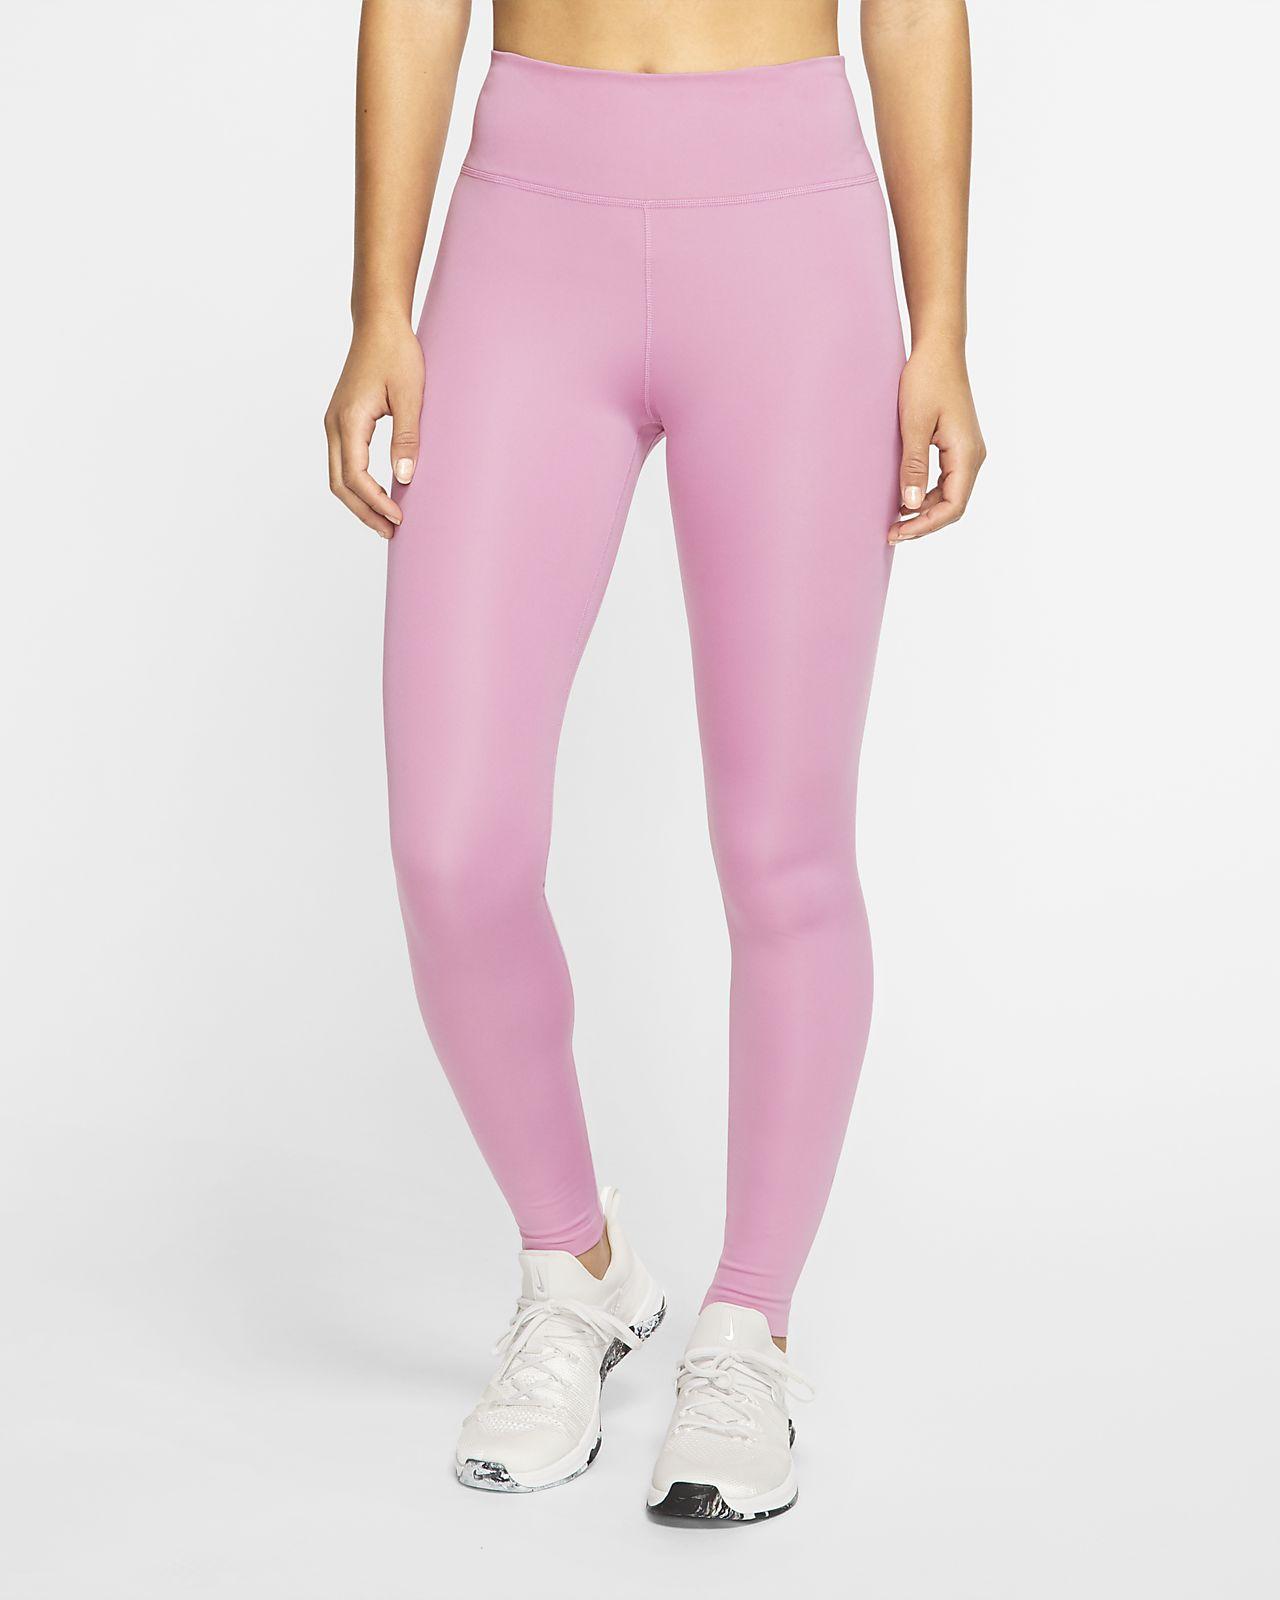 Legginsy damskie Nike One Luxe